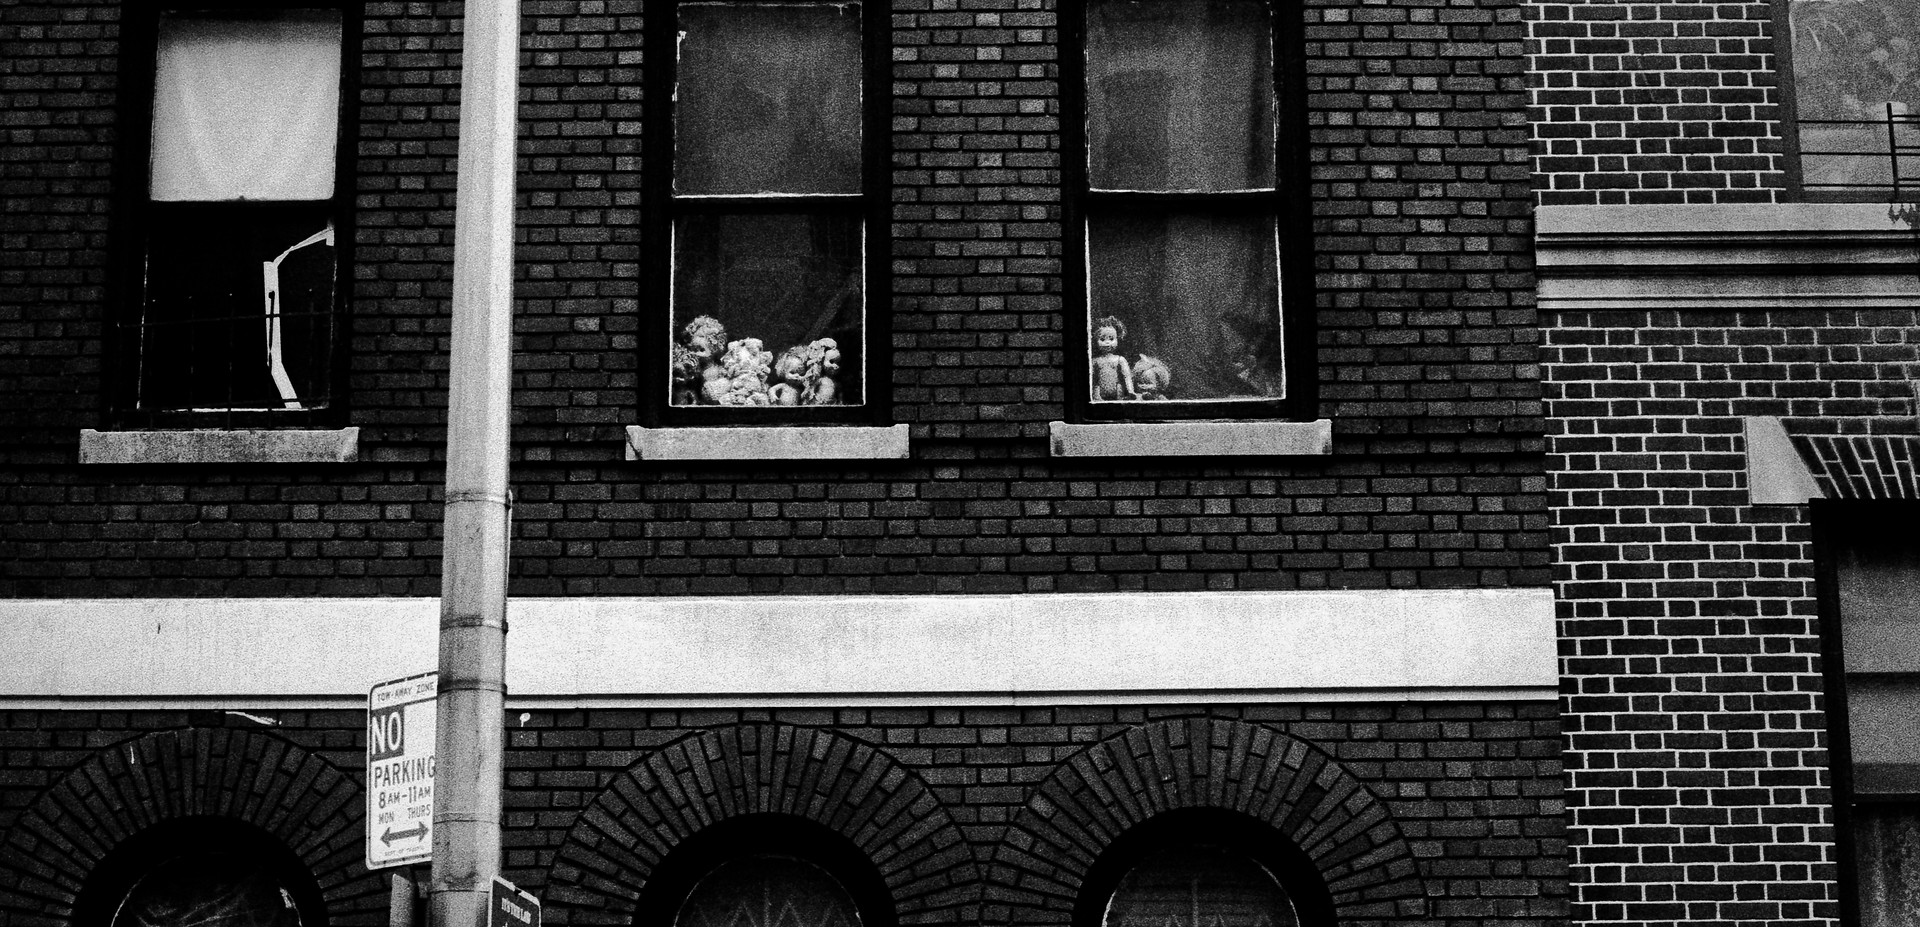 Manhatten_New York City, USA 1982